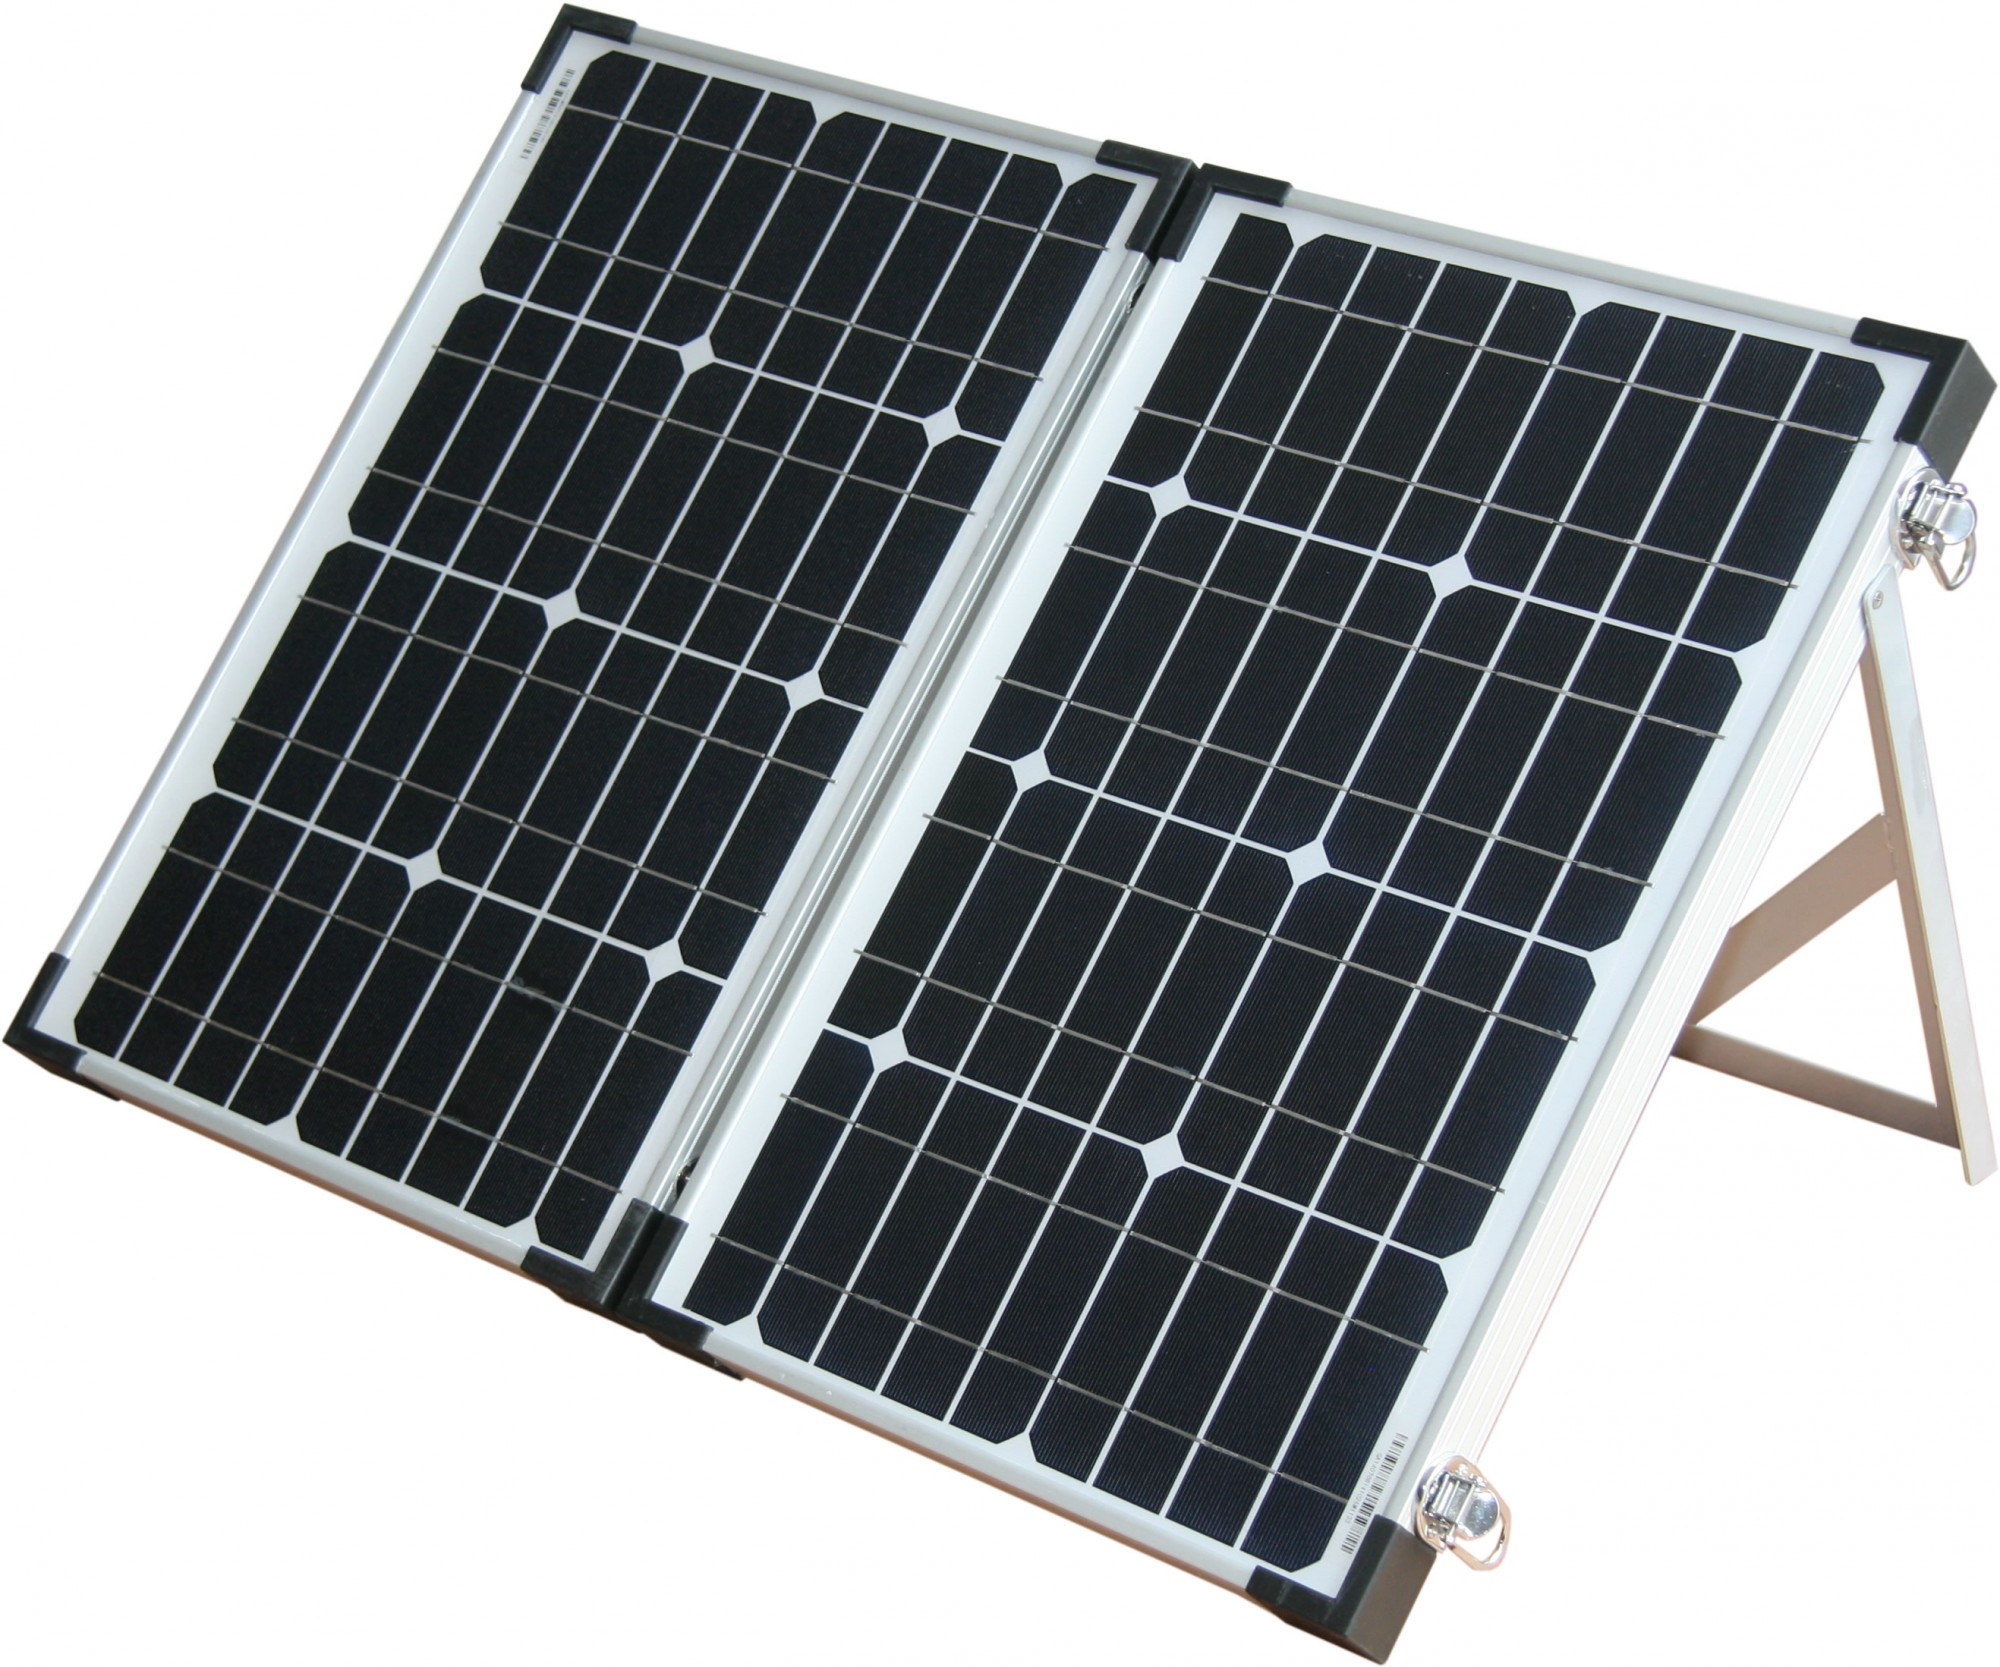 solarkoffer solarpanel solarmodul solaranlage solar. Black Bedroom Furniture Sets. Home Design Ideas